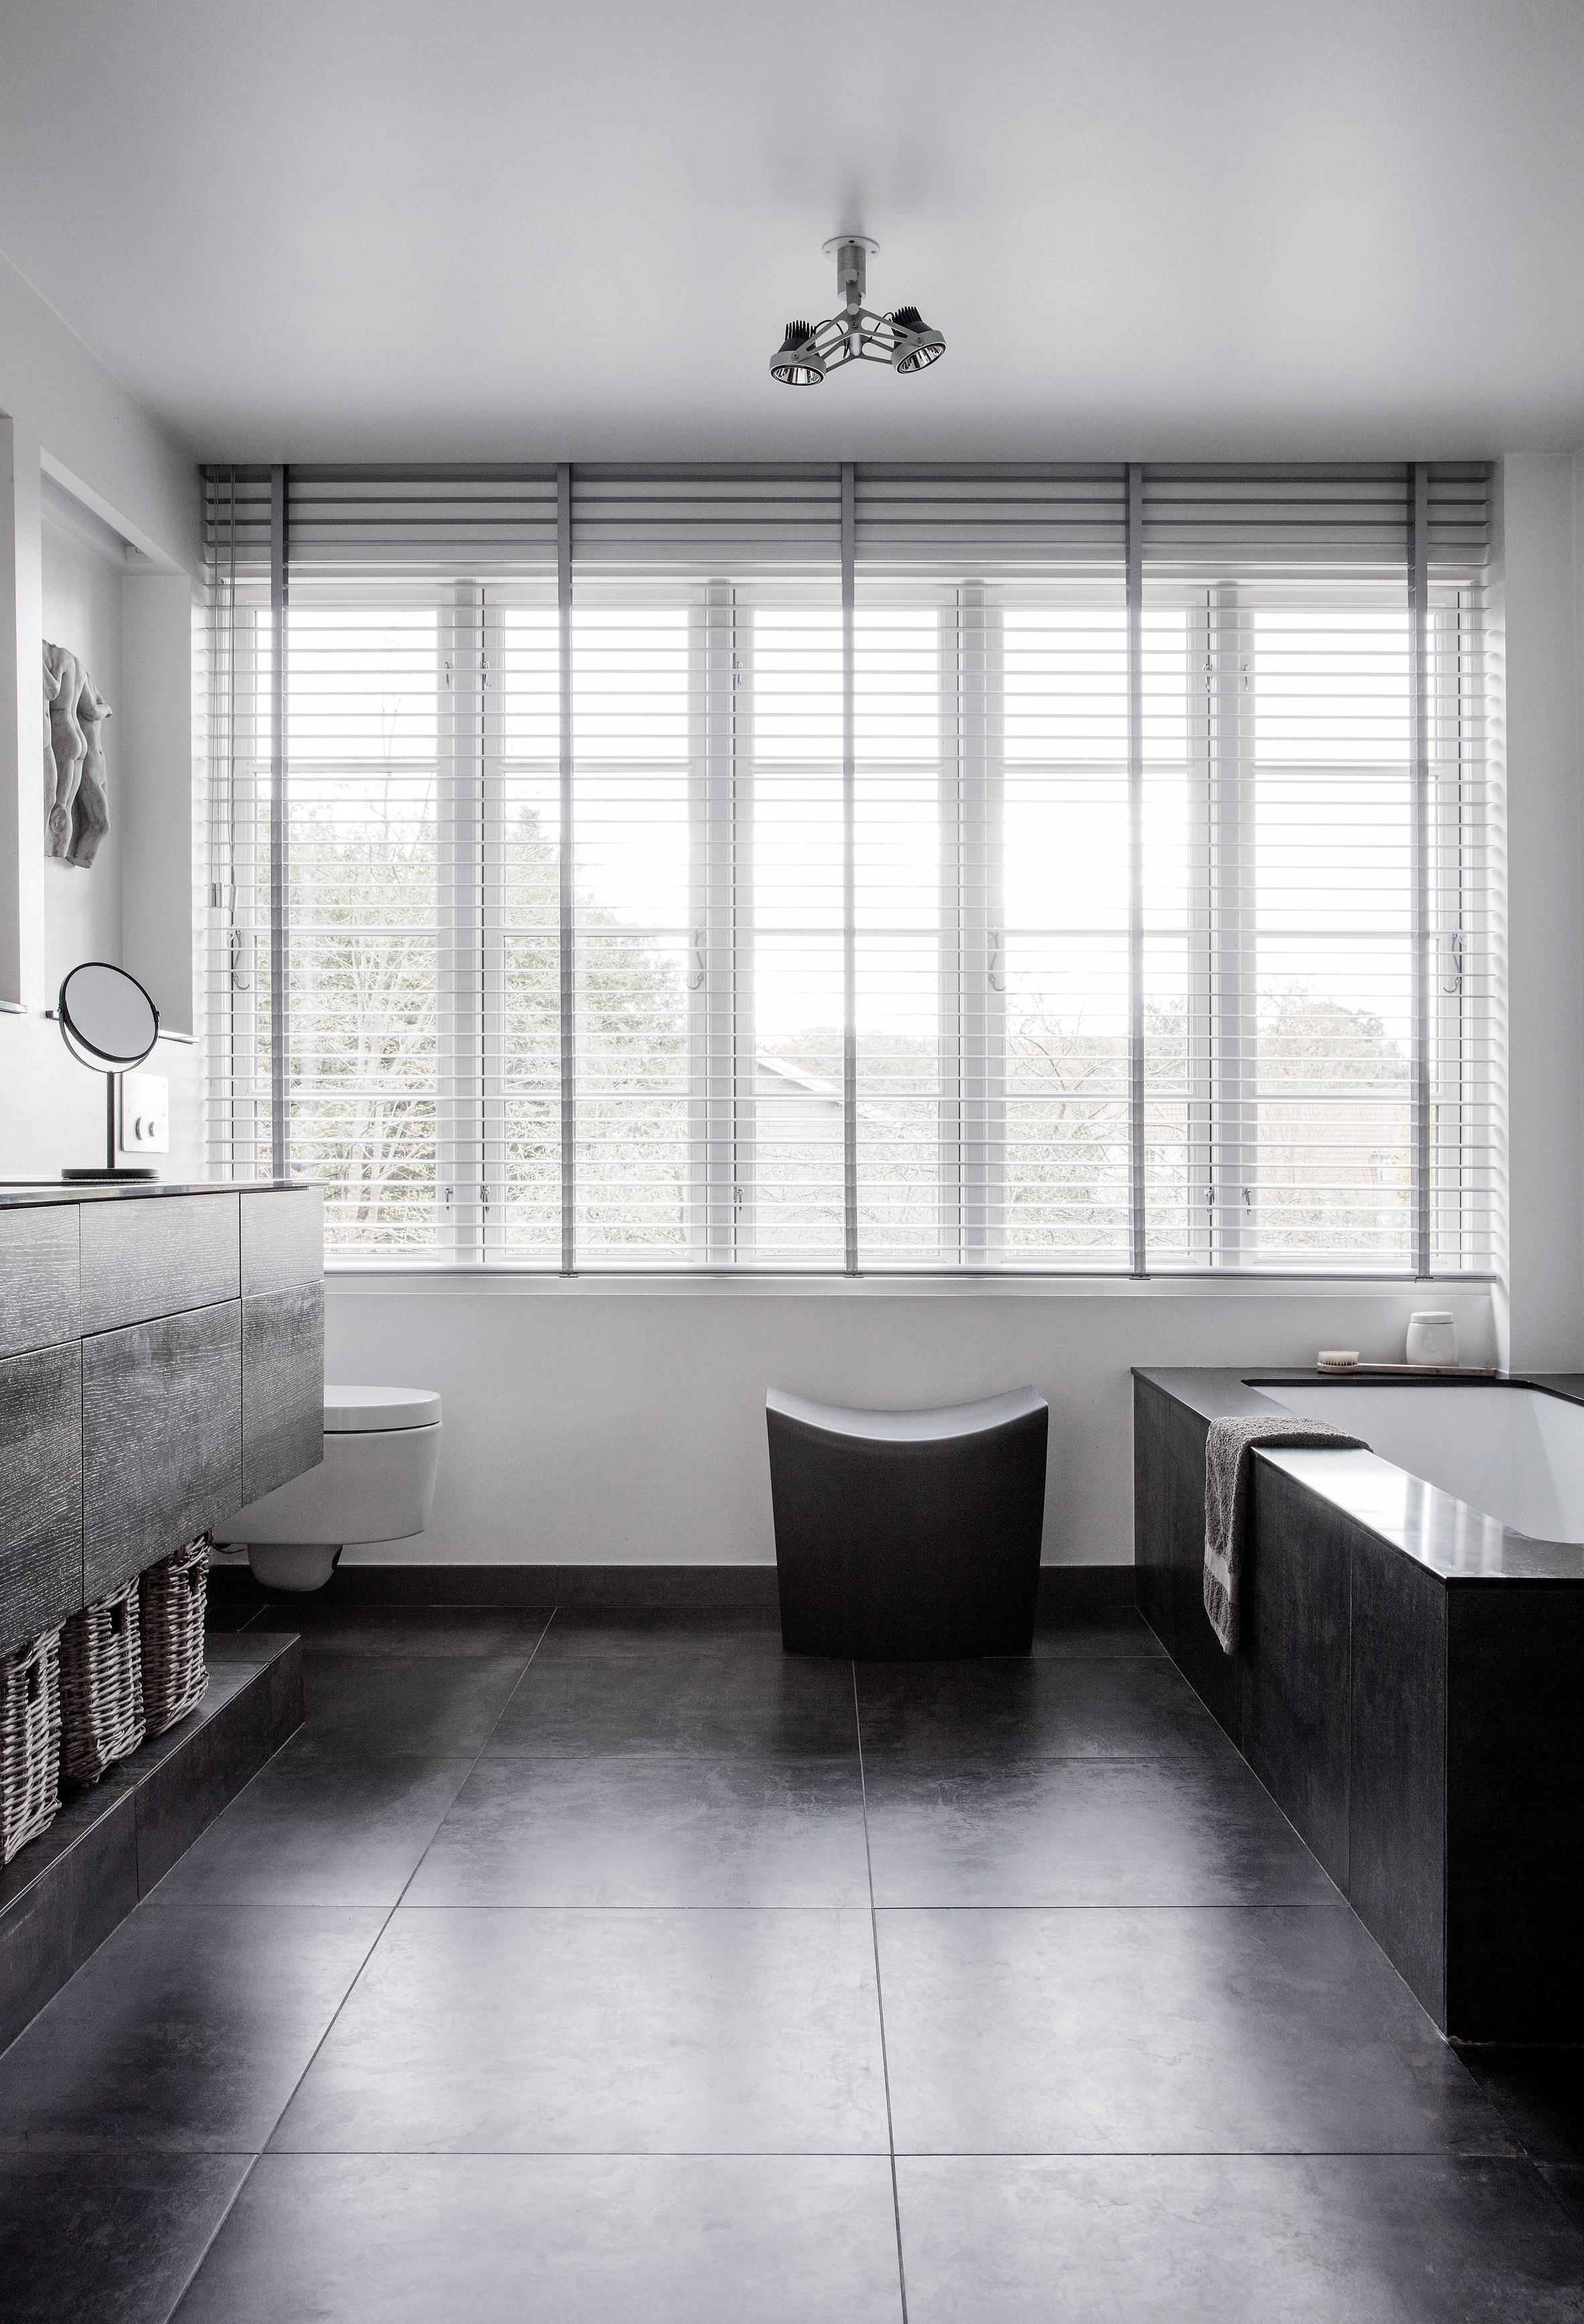 elledecoration vn nhà màu trung tính kaja-moller-home-fredericia-interiors-residential-copenhagen 7